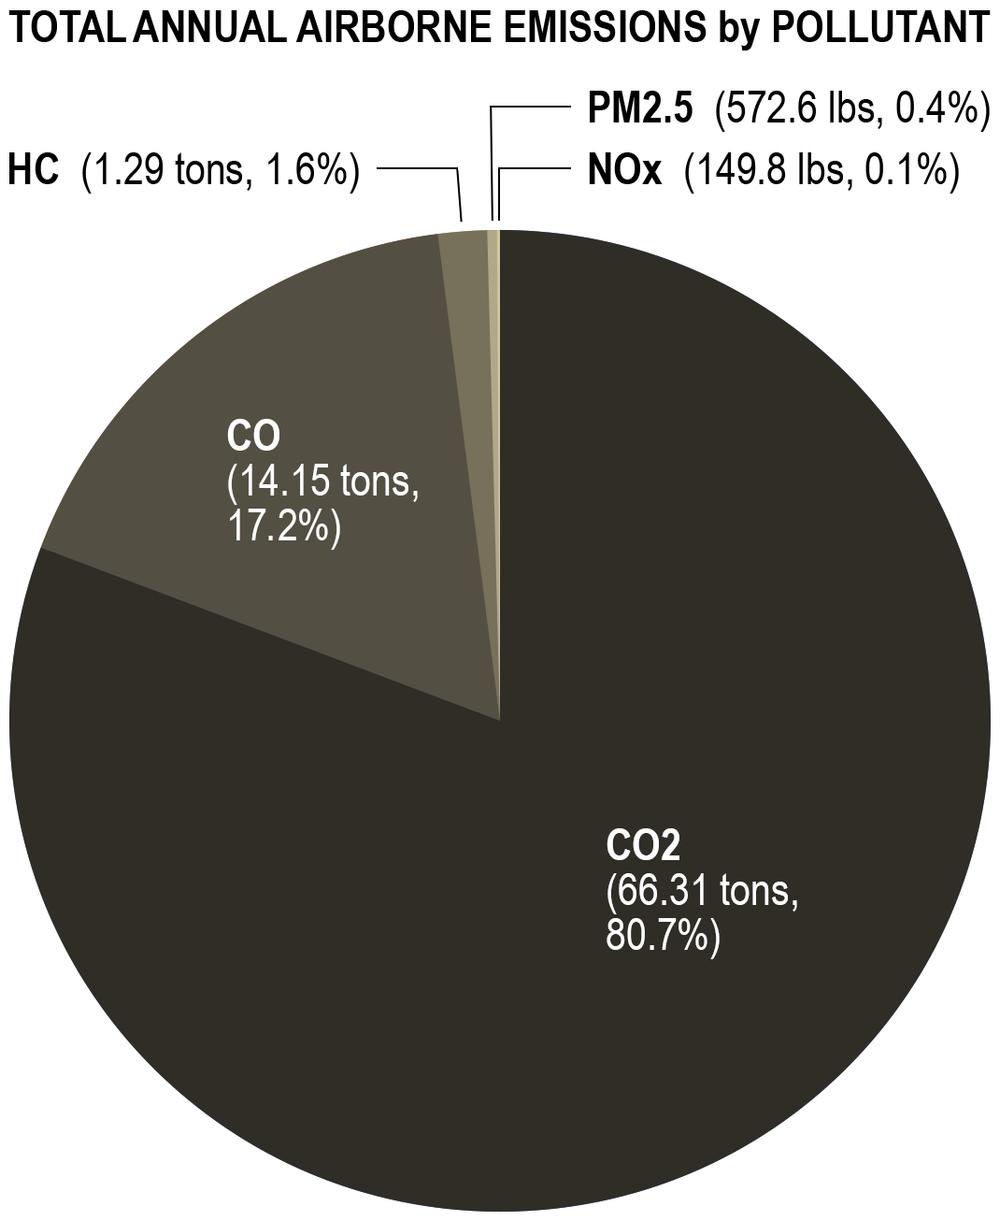 AGZA_GZ_Ojai_Pie_Charts_01_Emissions_1070.png